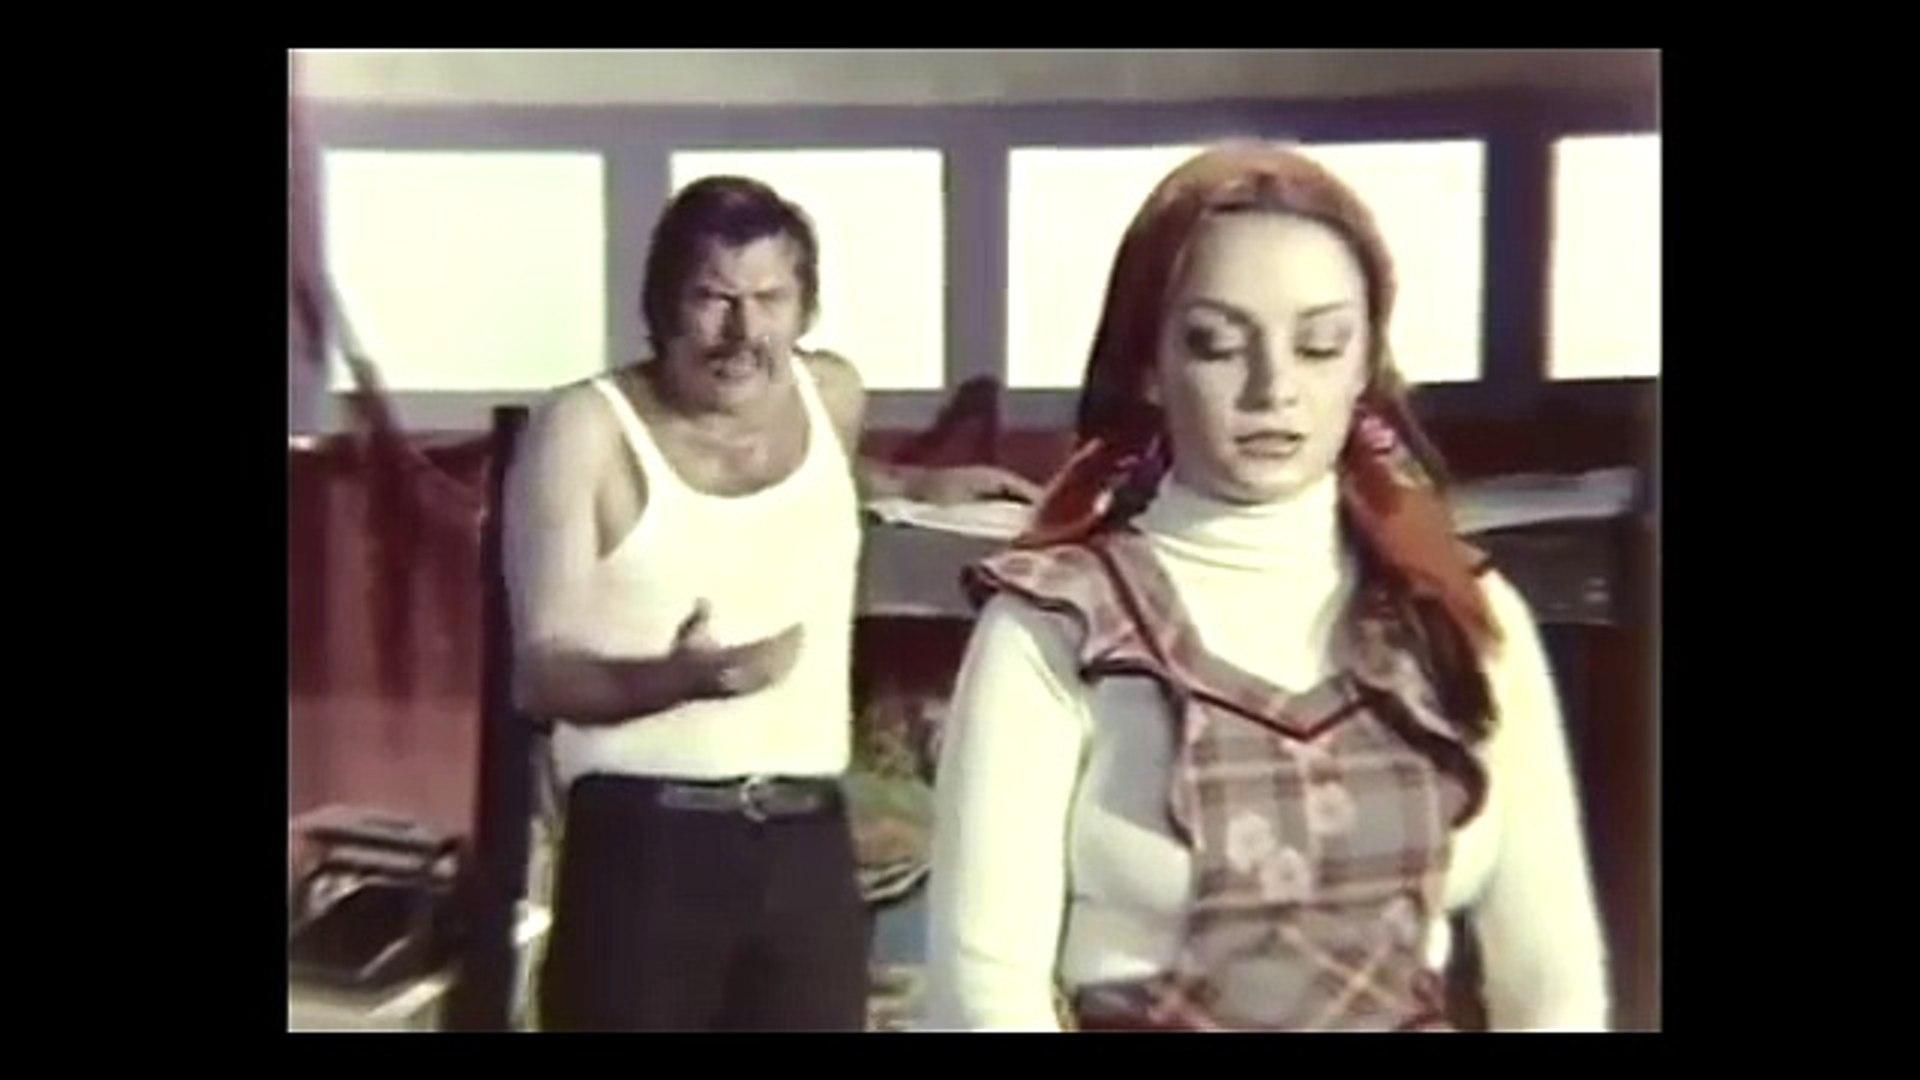 Tamer yiğit - Arzu Okay - Tepedeki Ev (1976)